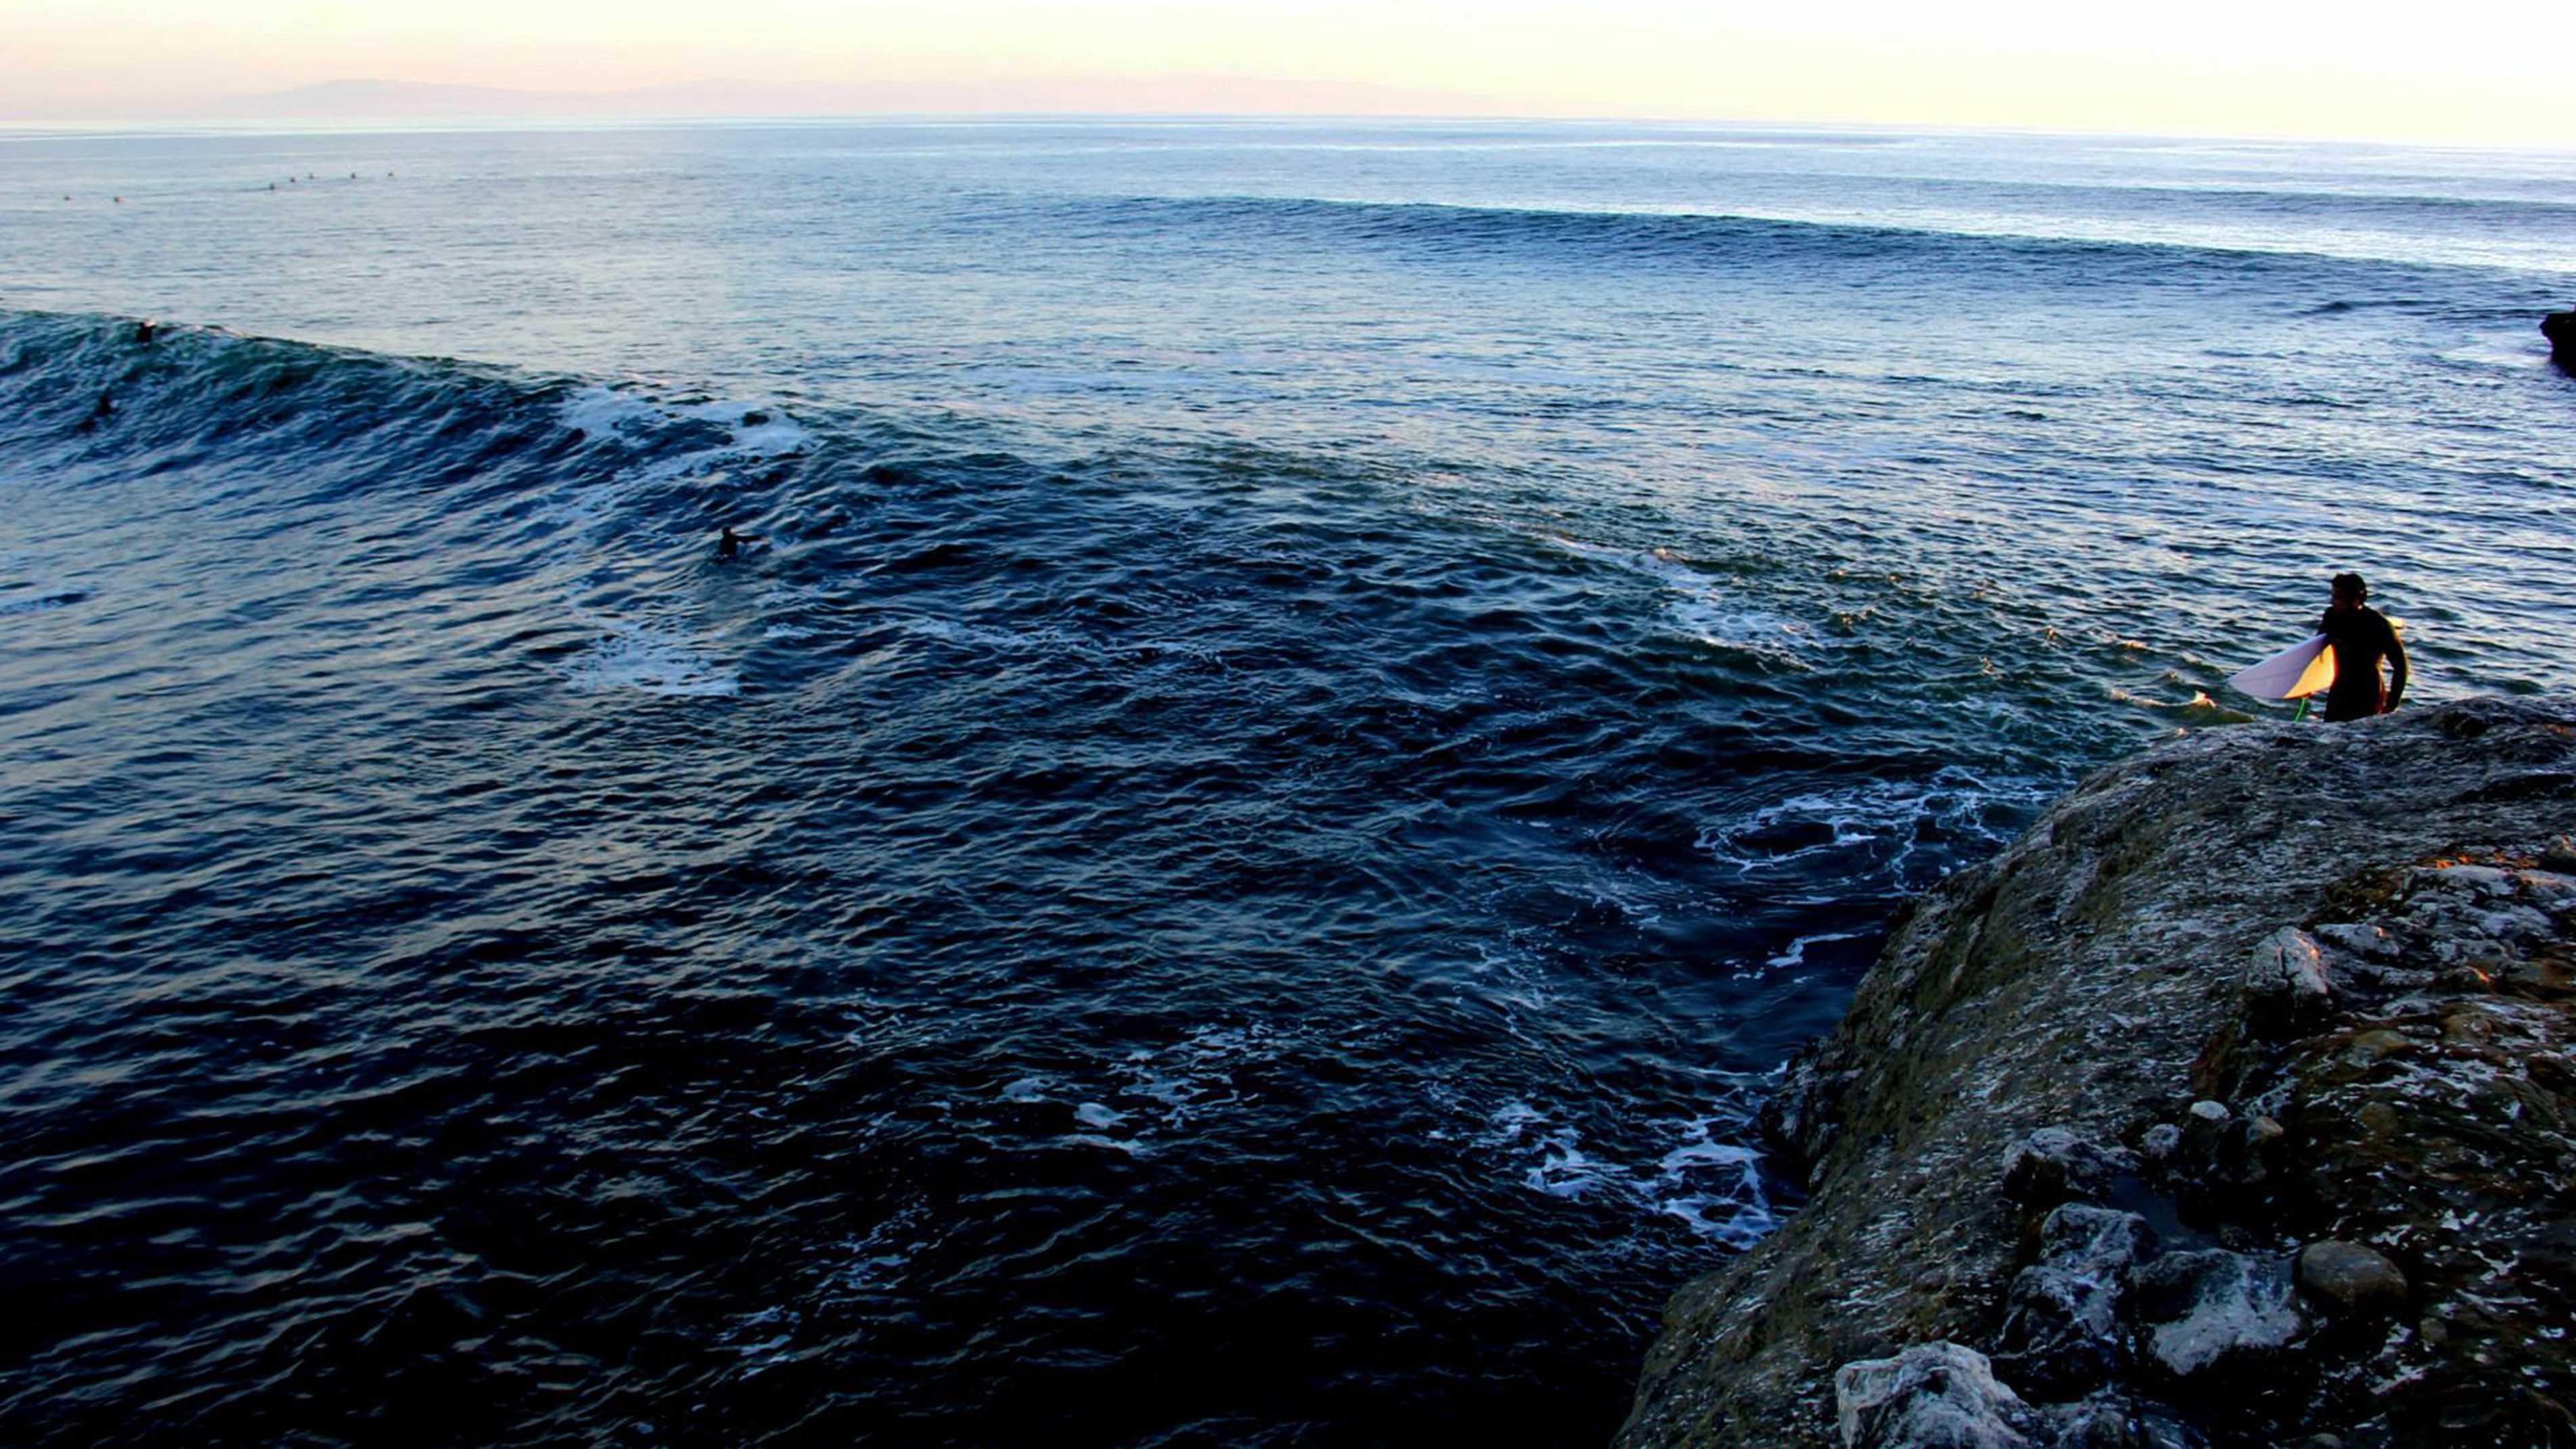 Waves roll in at Steamer Lane in Santa Cruz.